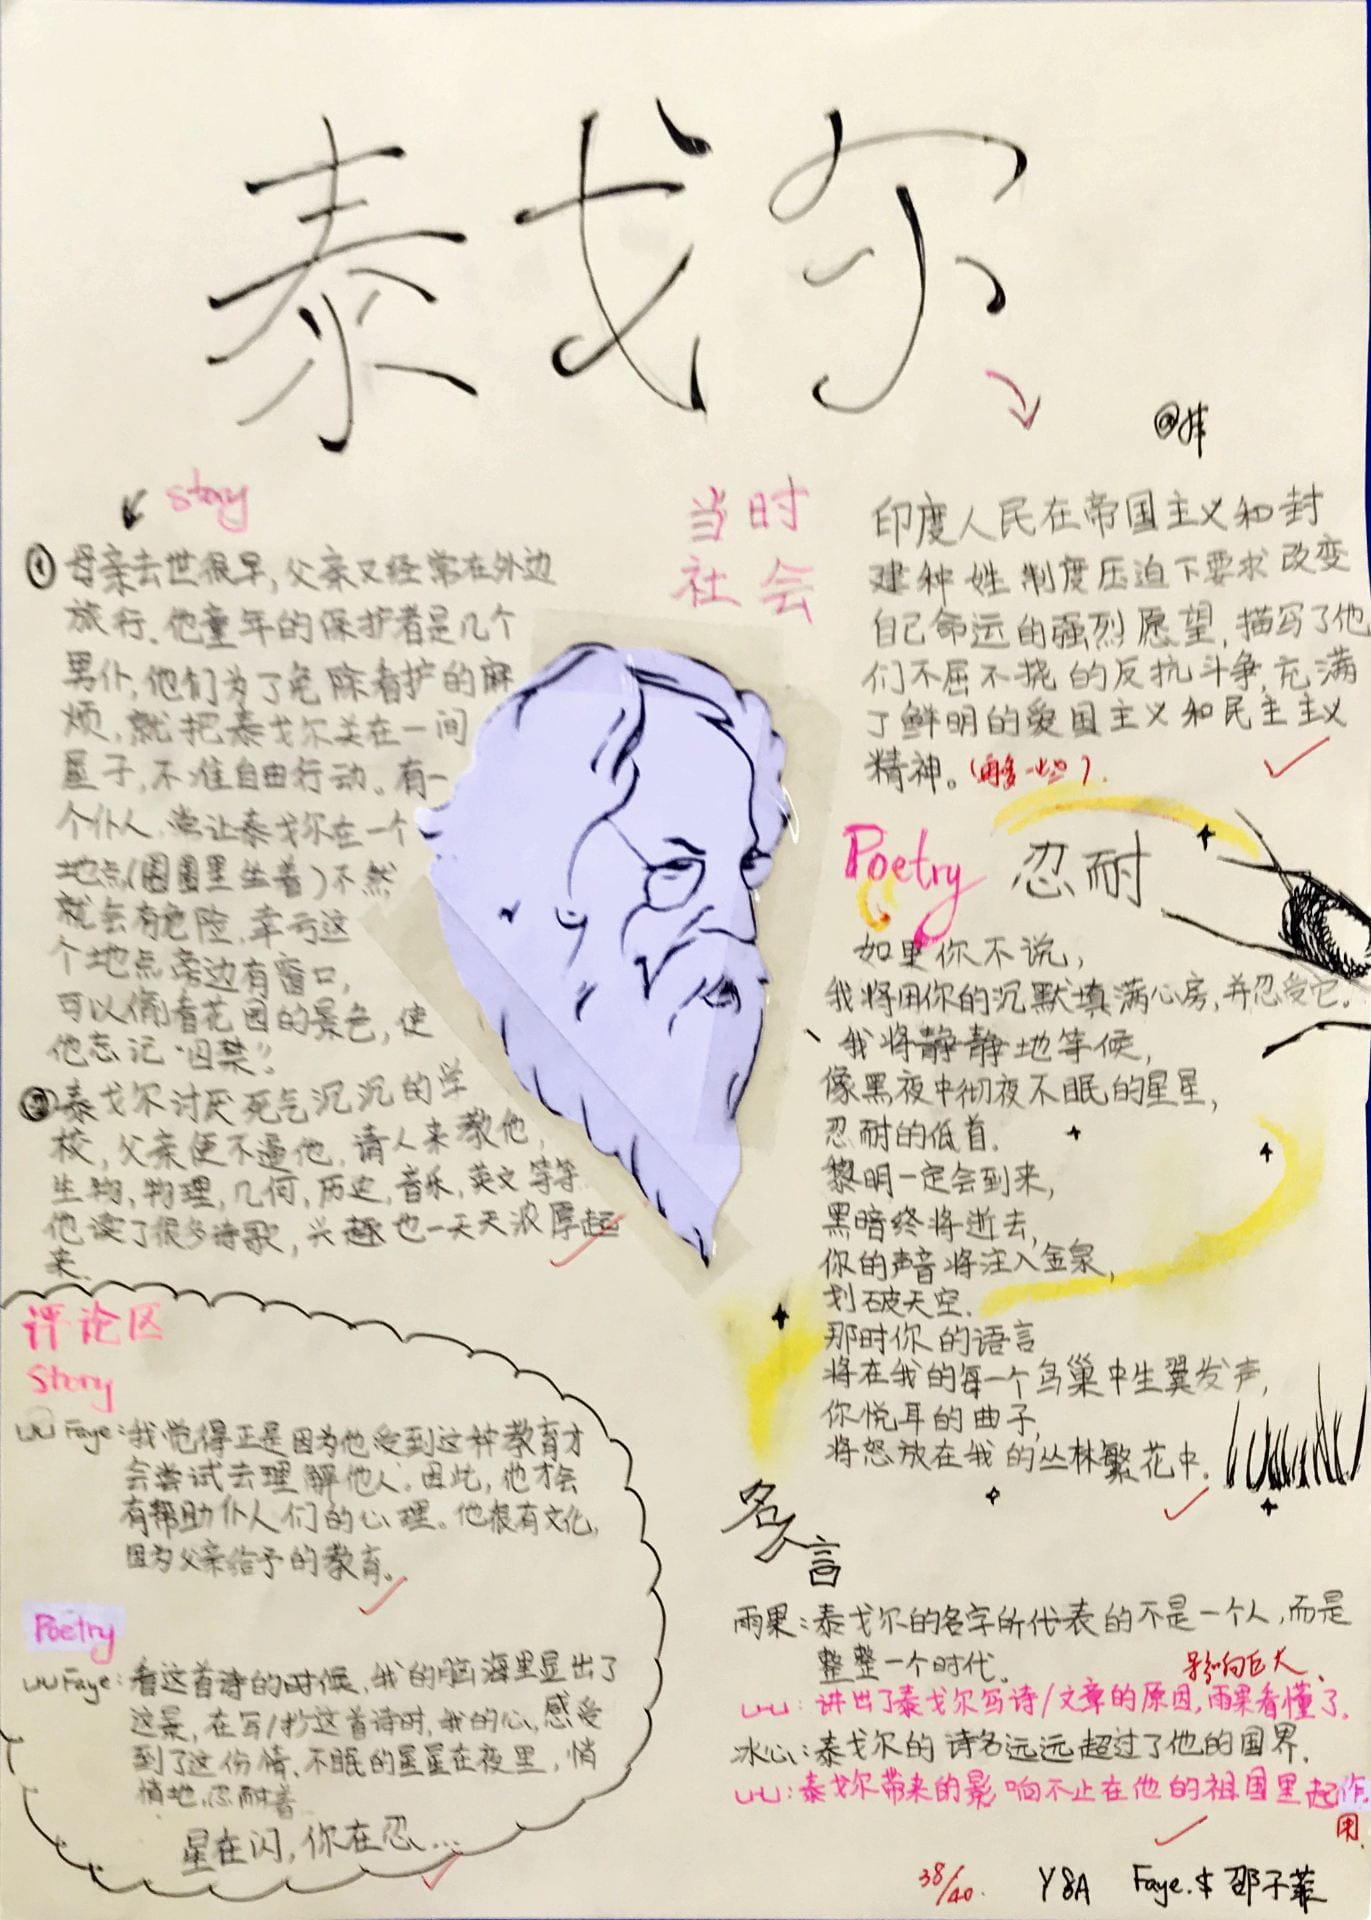 《泰戈尔》海报-CFL Y8 邵子菲